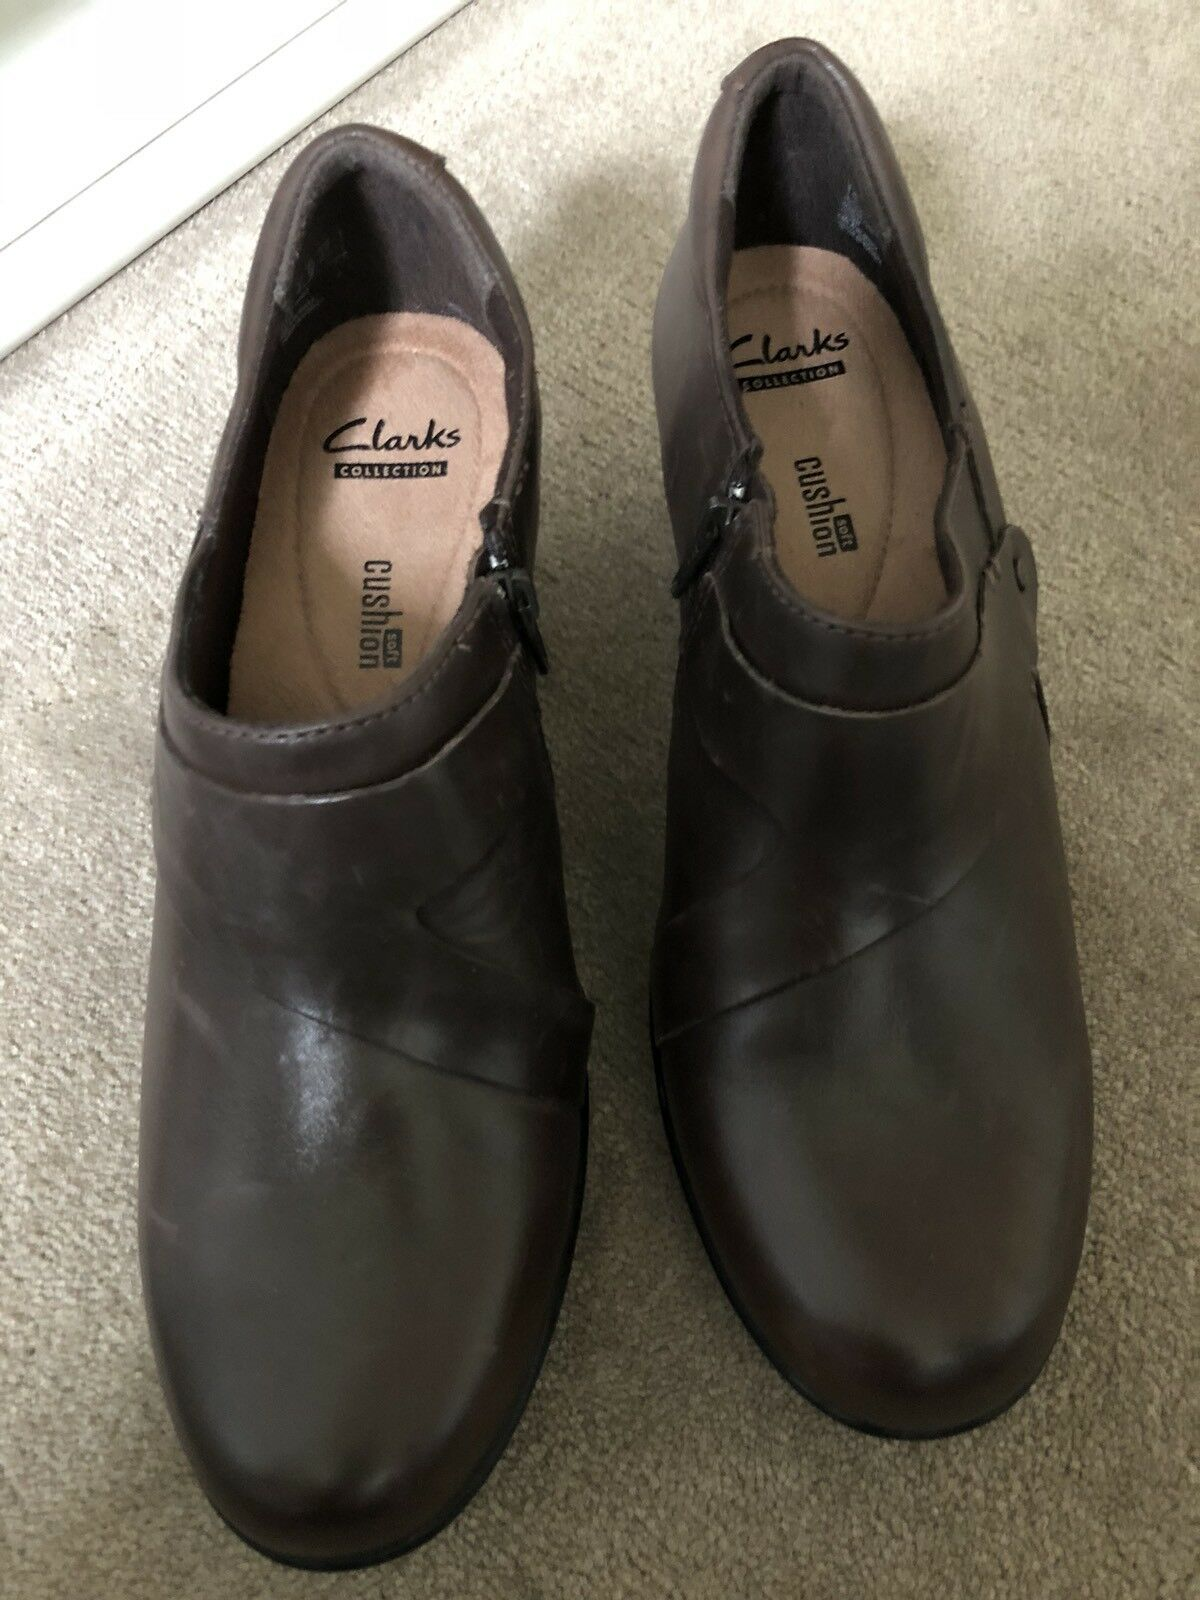 Clarks Clarks Clarks Damenschuhe Braun Leder Schuhes UK Größe 6.5 - Cushion Soft For Extra Comfort 8114cf